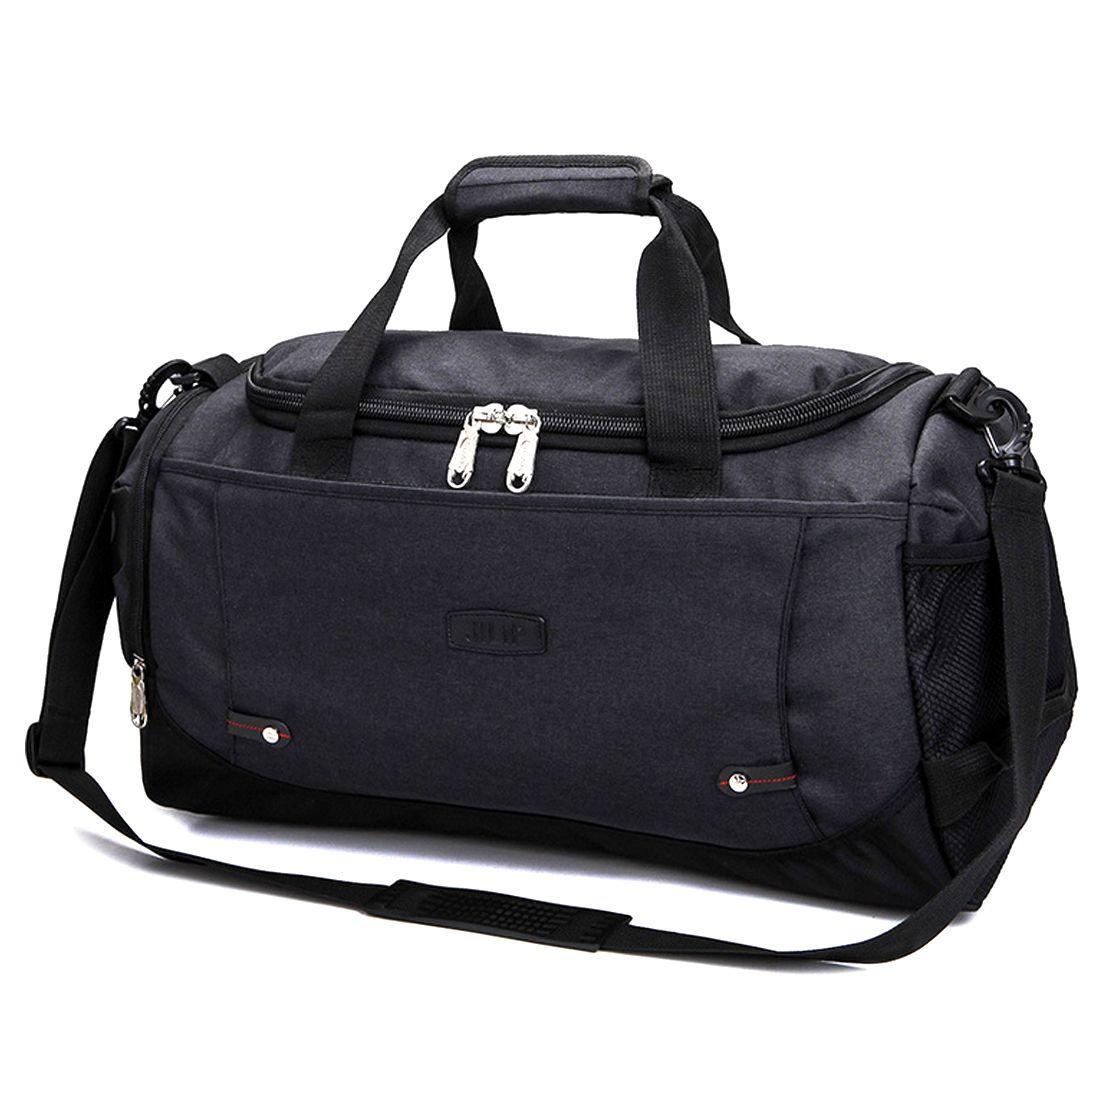 0dac9dab31d5 ... pretty nice 901fc a55b6 ARESLAND Man Travel Bags Big Capacity Polyester  Casual Male Handbag Business Trip ...